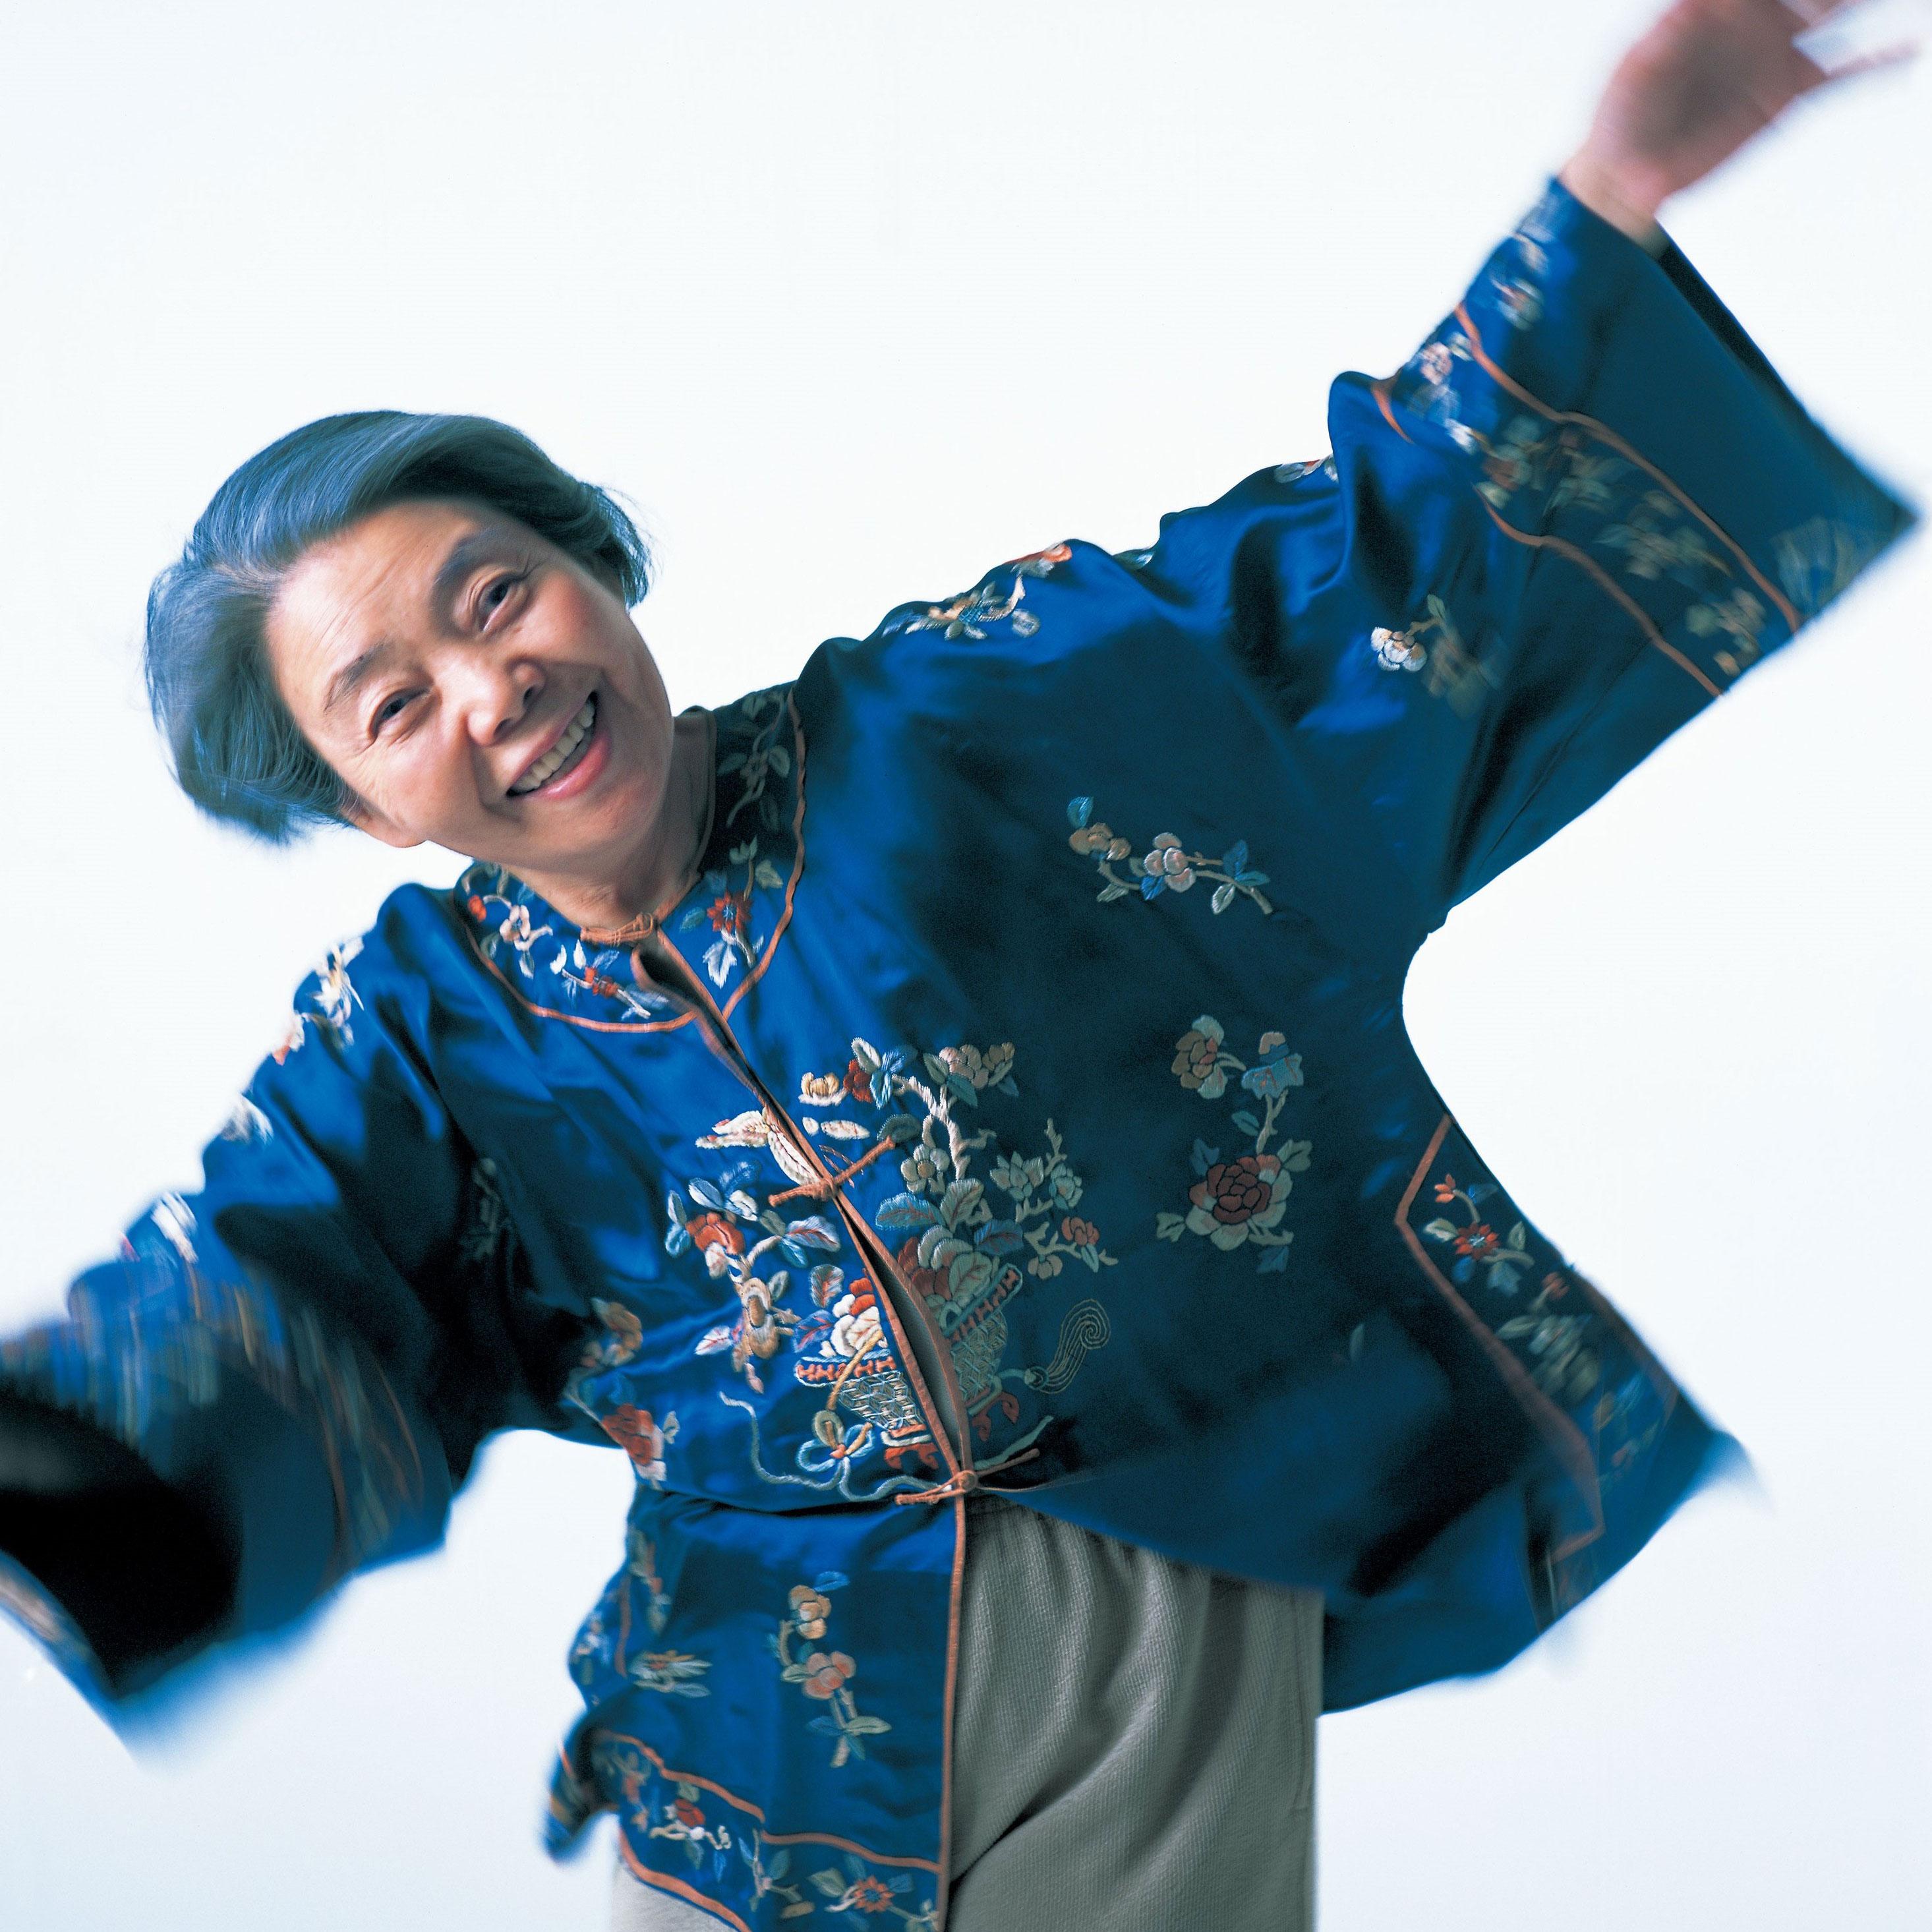 """KILINワールド""を愛するすべての人へ。横浜で樹木希林さんの足跡を追う展覧会が開催"